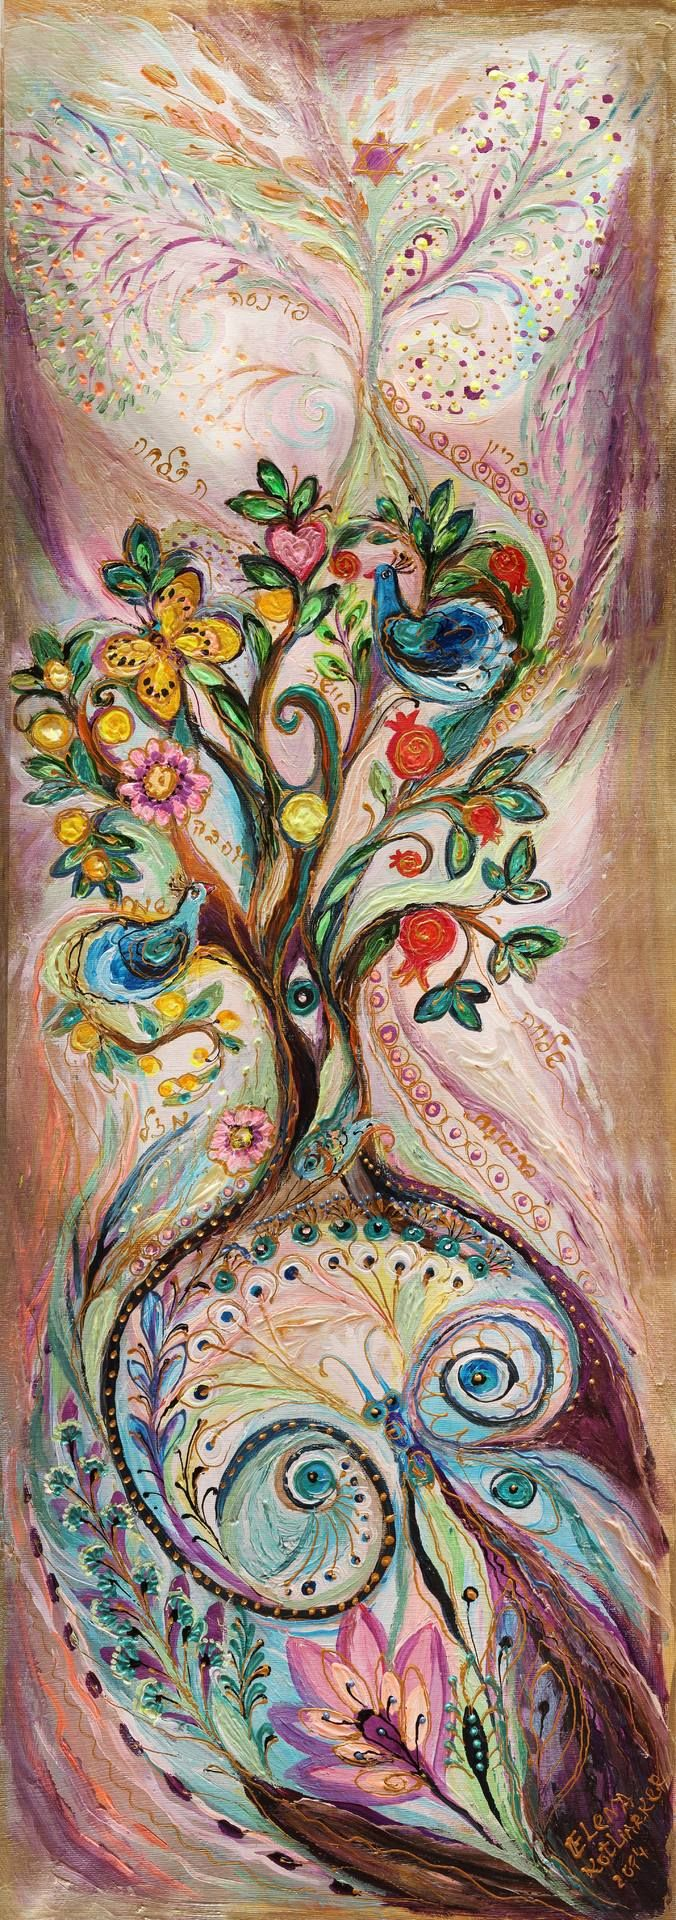 "Saatchi Art Artist: Elena Kotliarker; Acrylic 2014 Painting ""The Tree of Life II"""